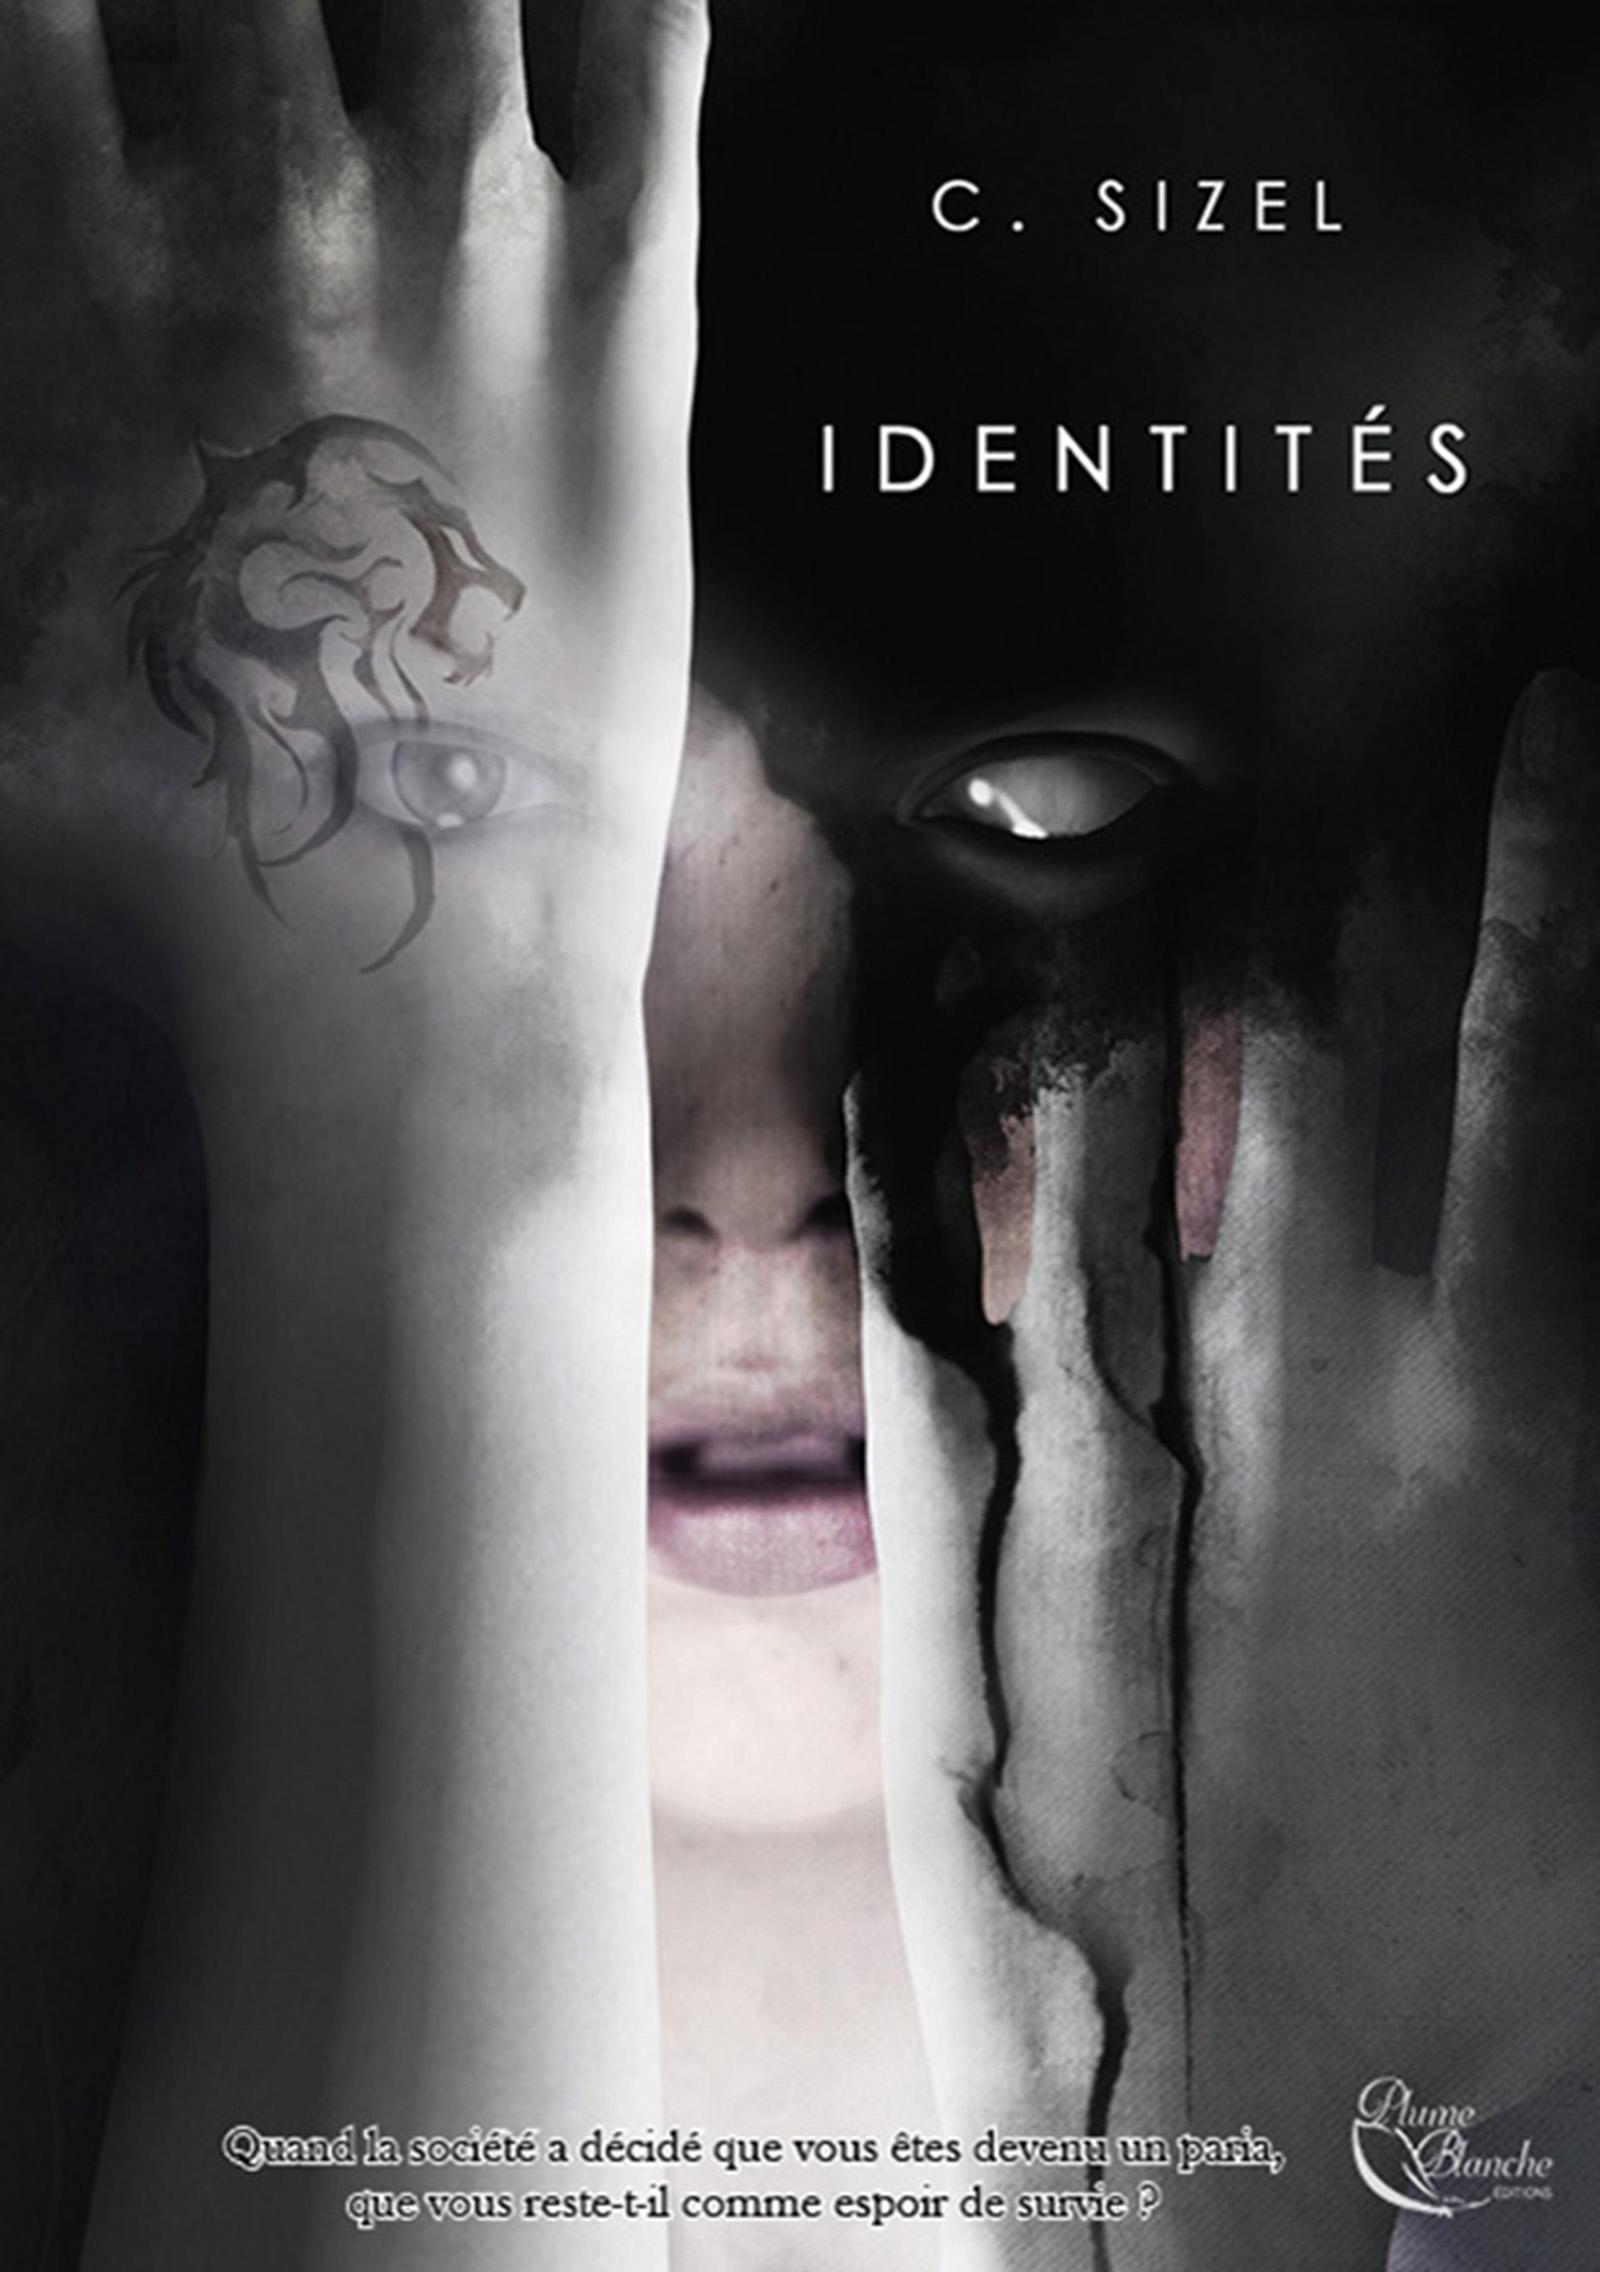 Identités, Un thriller futuriste haletant